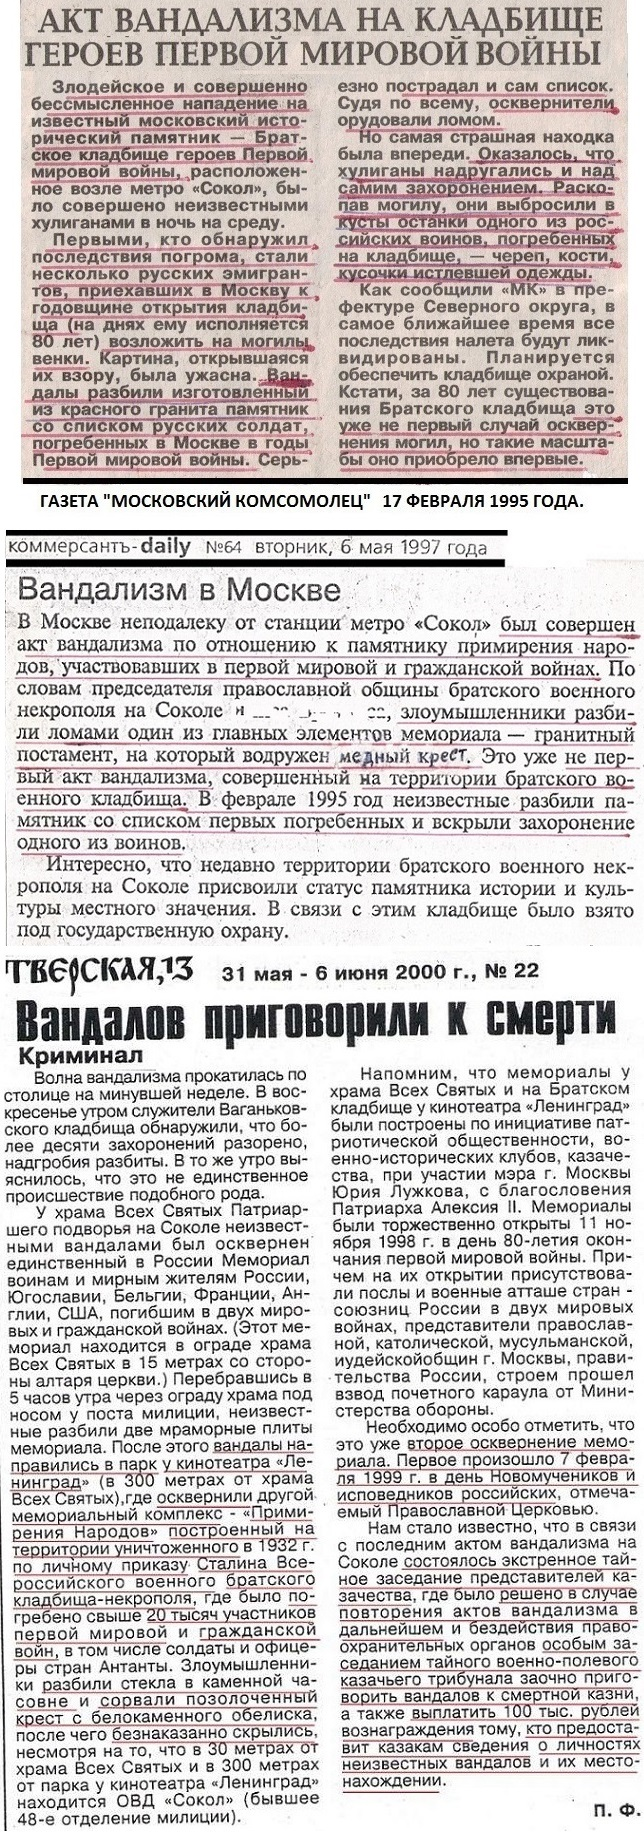 https://img-fotki.yandex.ru/get/3300/287625778.2/0_104bf0_a97880e7_orig.jpg